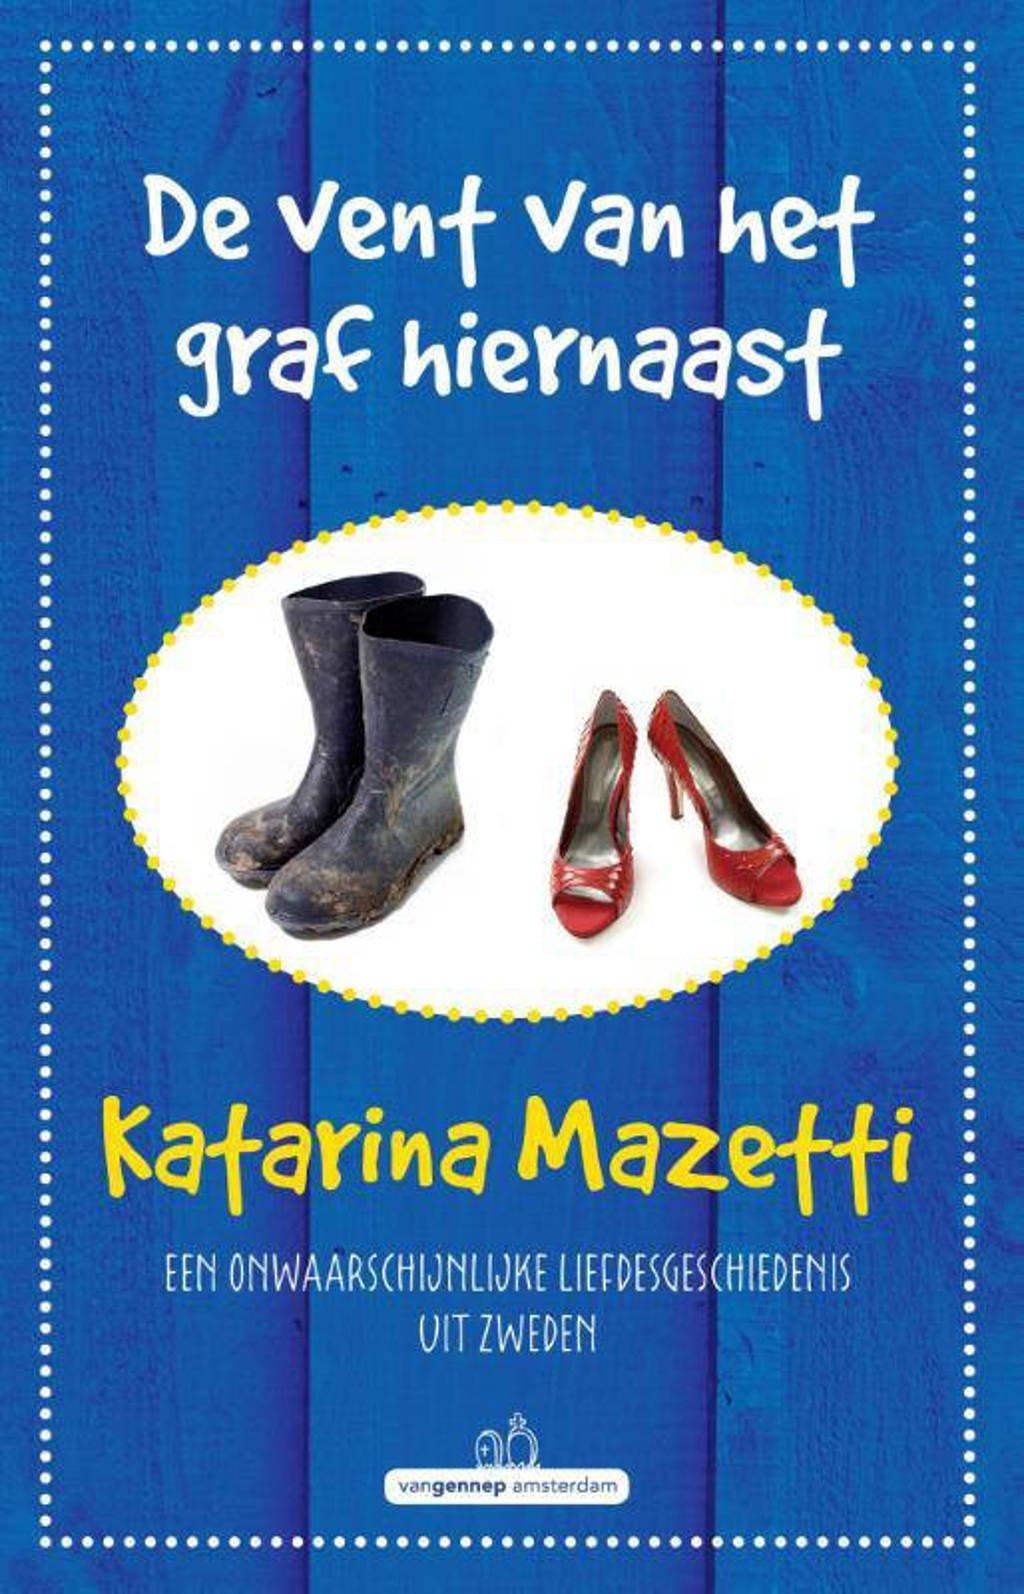 De vent van het graf hiernaast - Katarina Mazetti